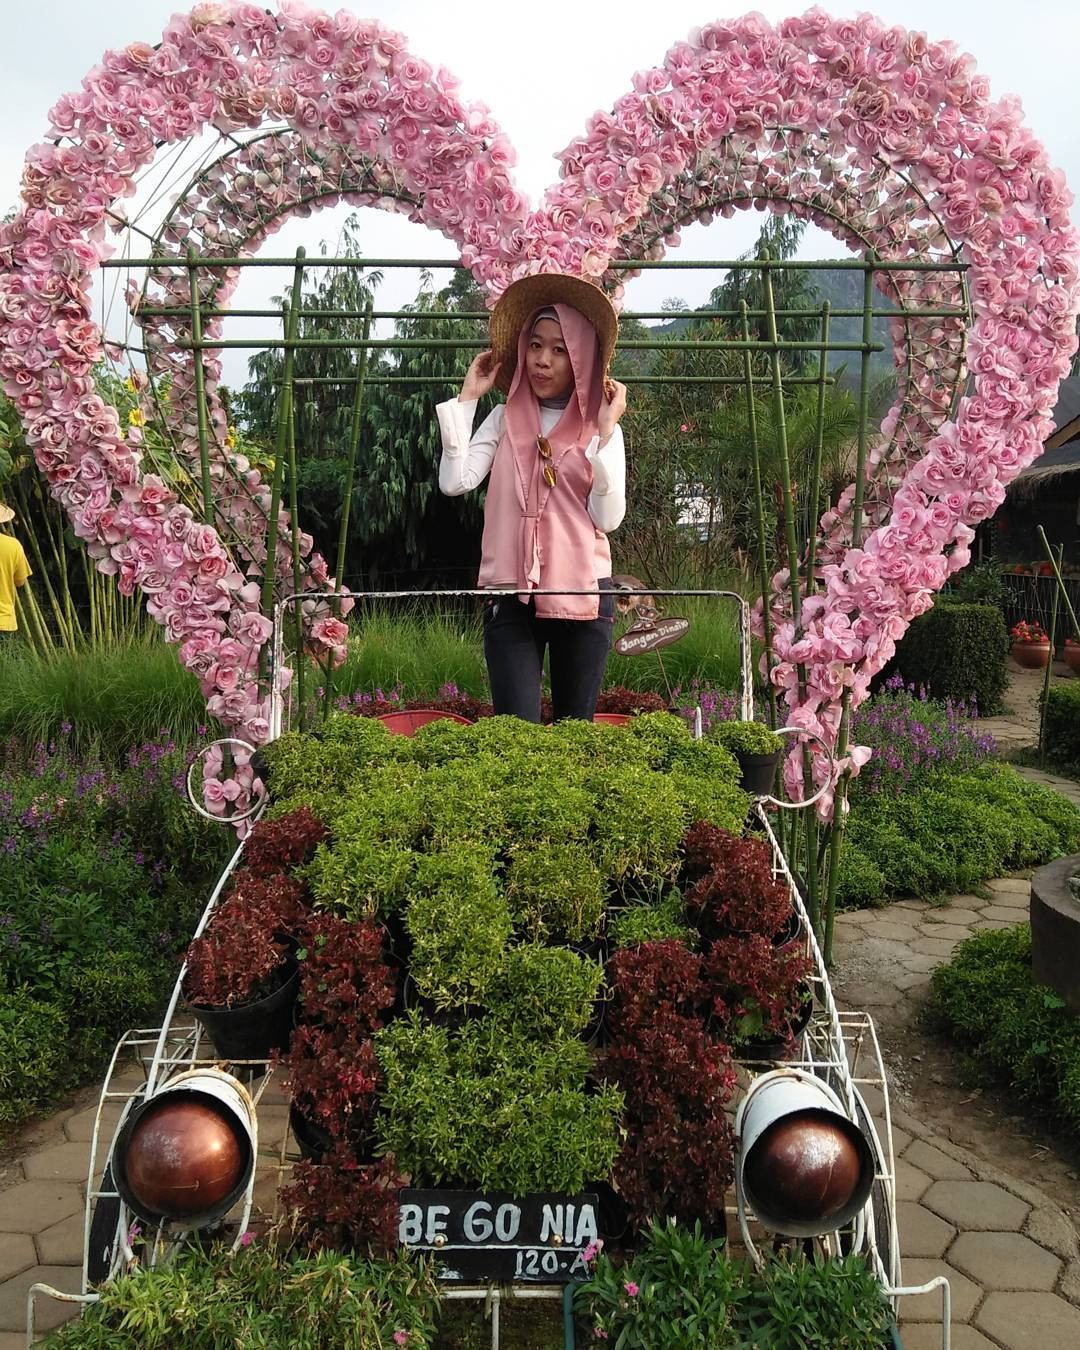 Piknikyok Rute Lokasi Kebun Bunga Begonia Lembang Taman Romantis Bandung